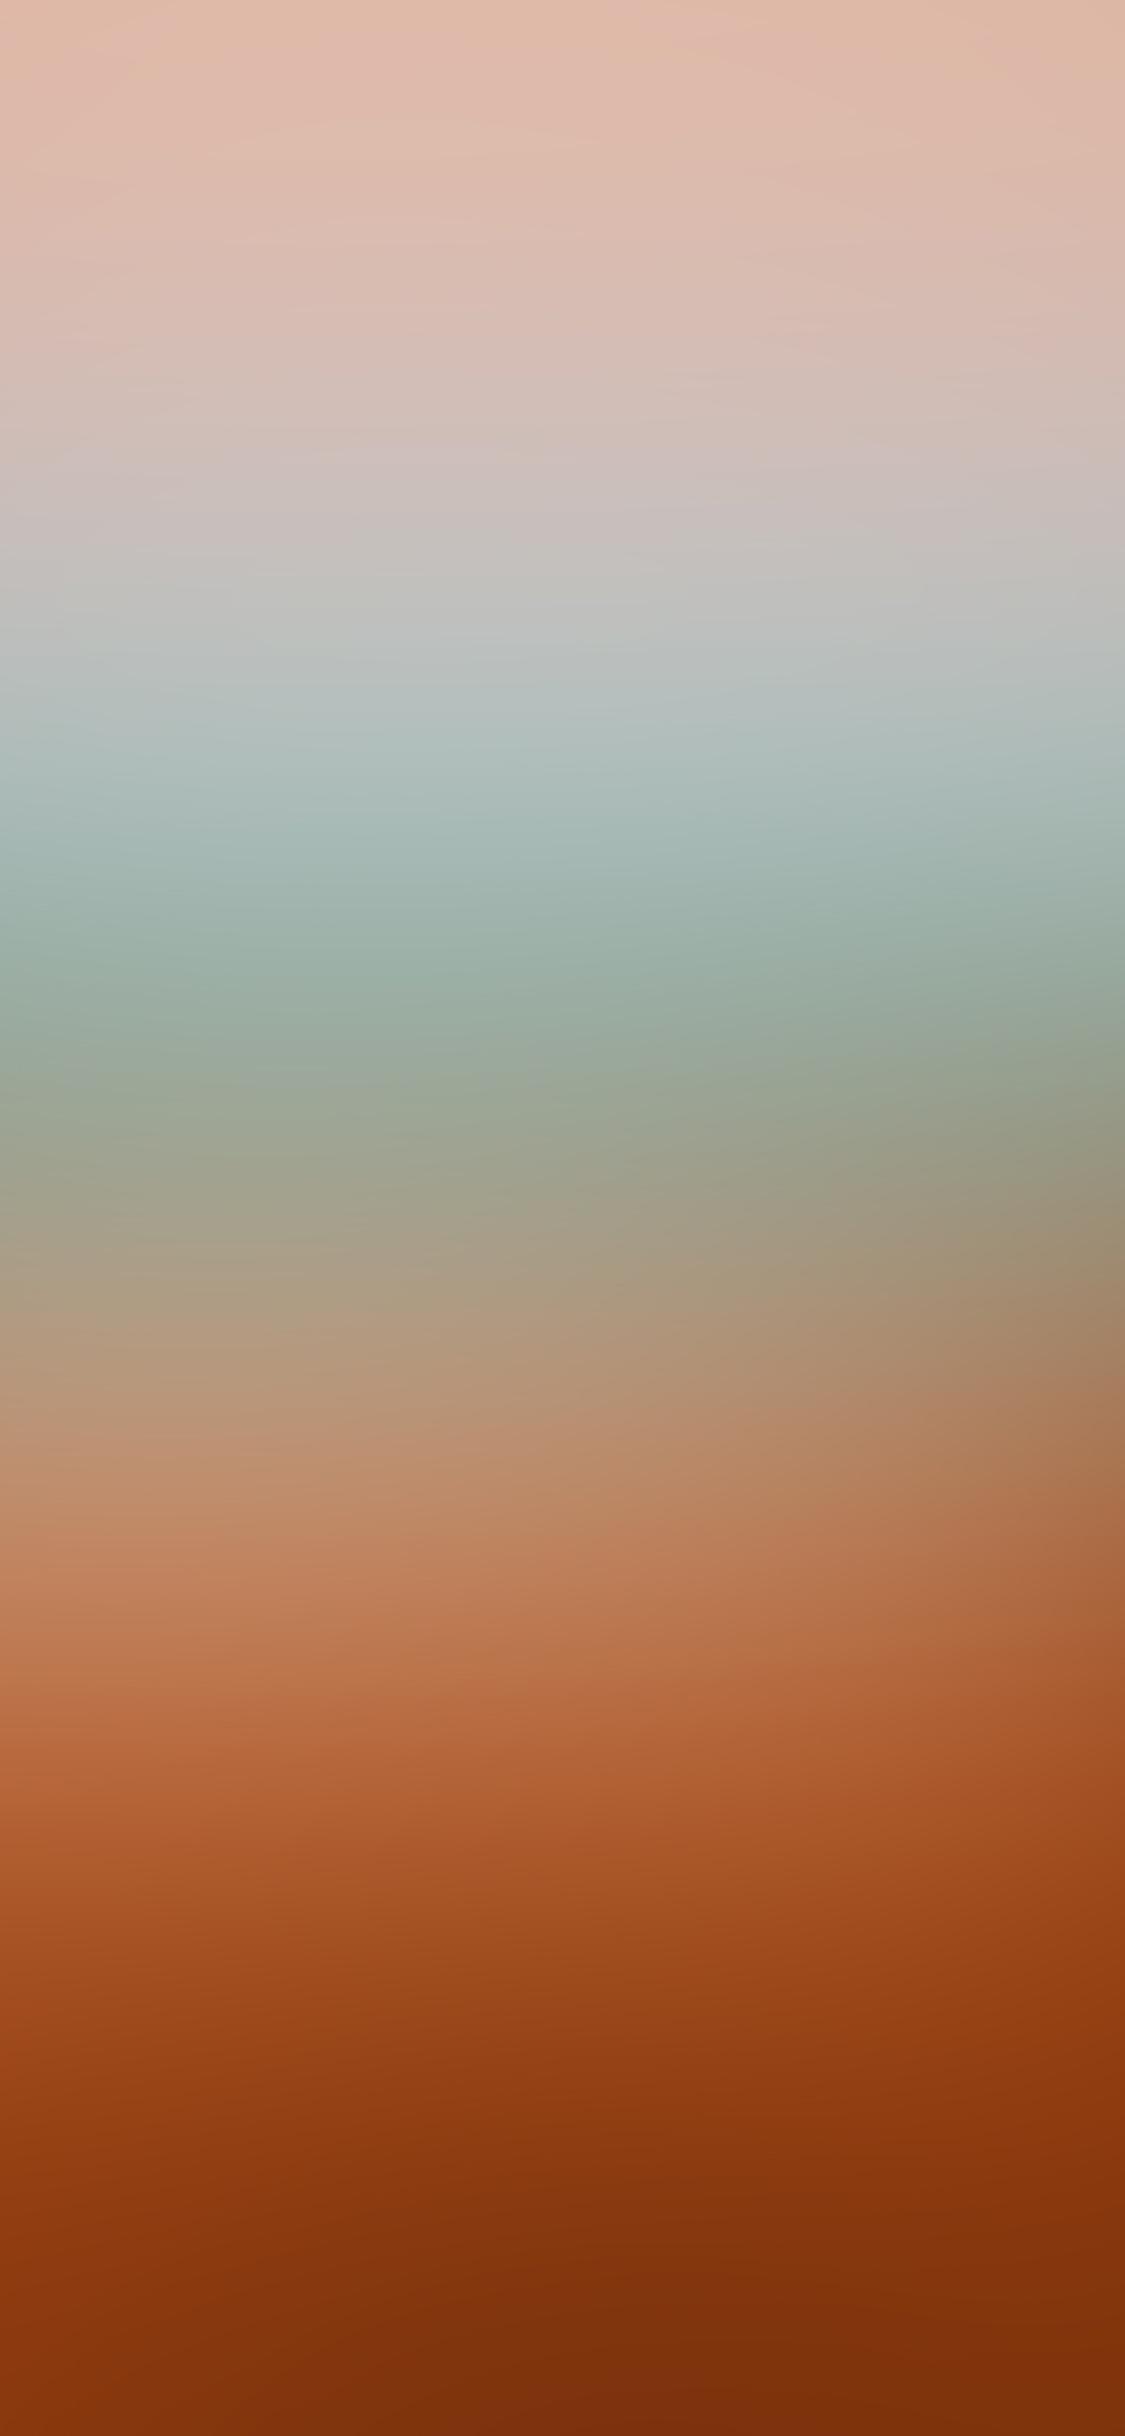 iPhoneXpapers.com-Apple-iPhone-wallpaper-sk79-orange-soft-blur-gradation